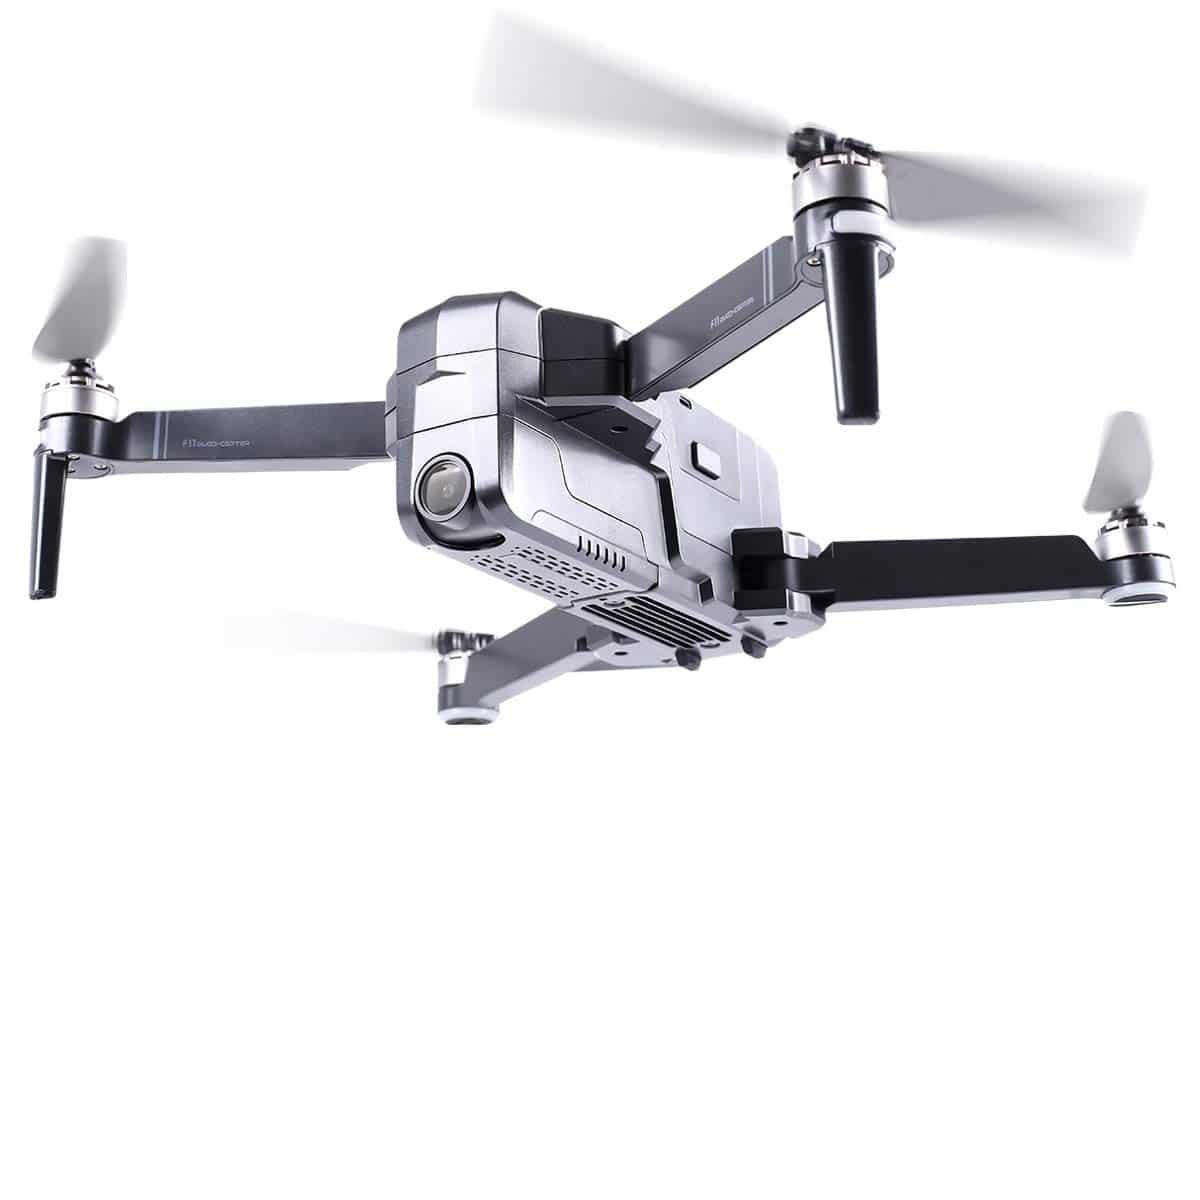 Unbiased Ruko F11 Pro 4K Drone Review